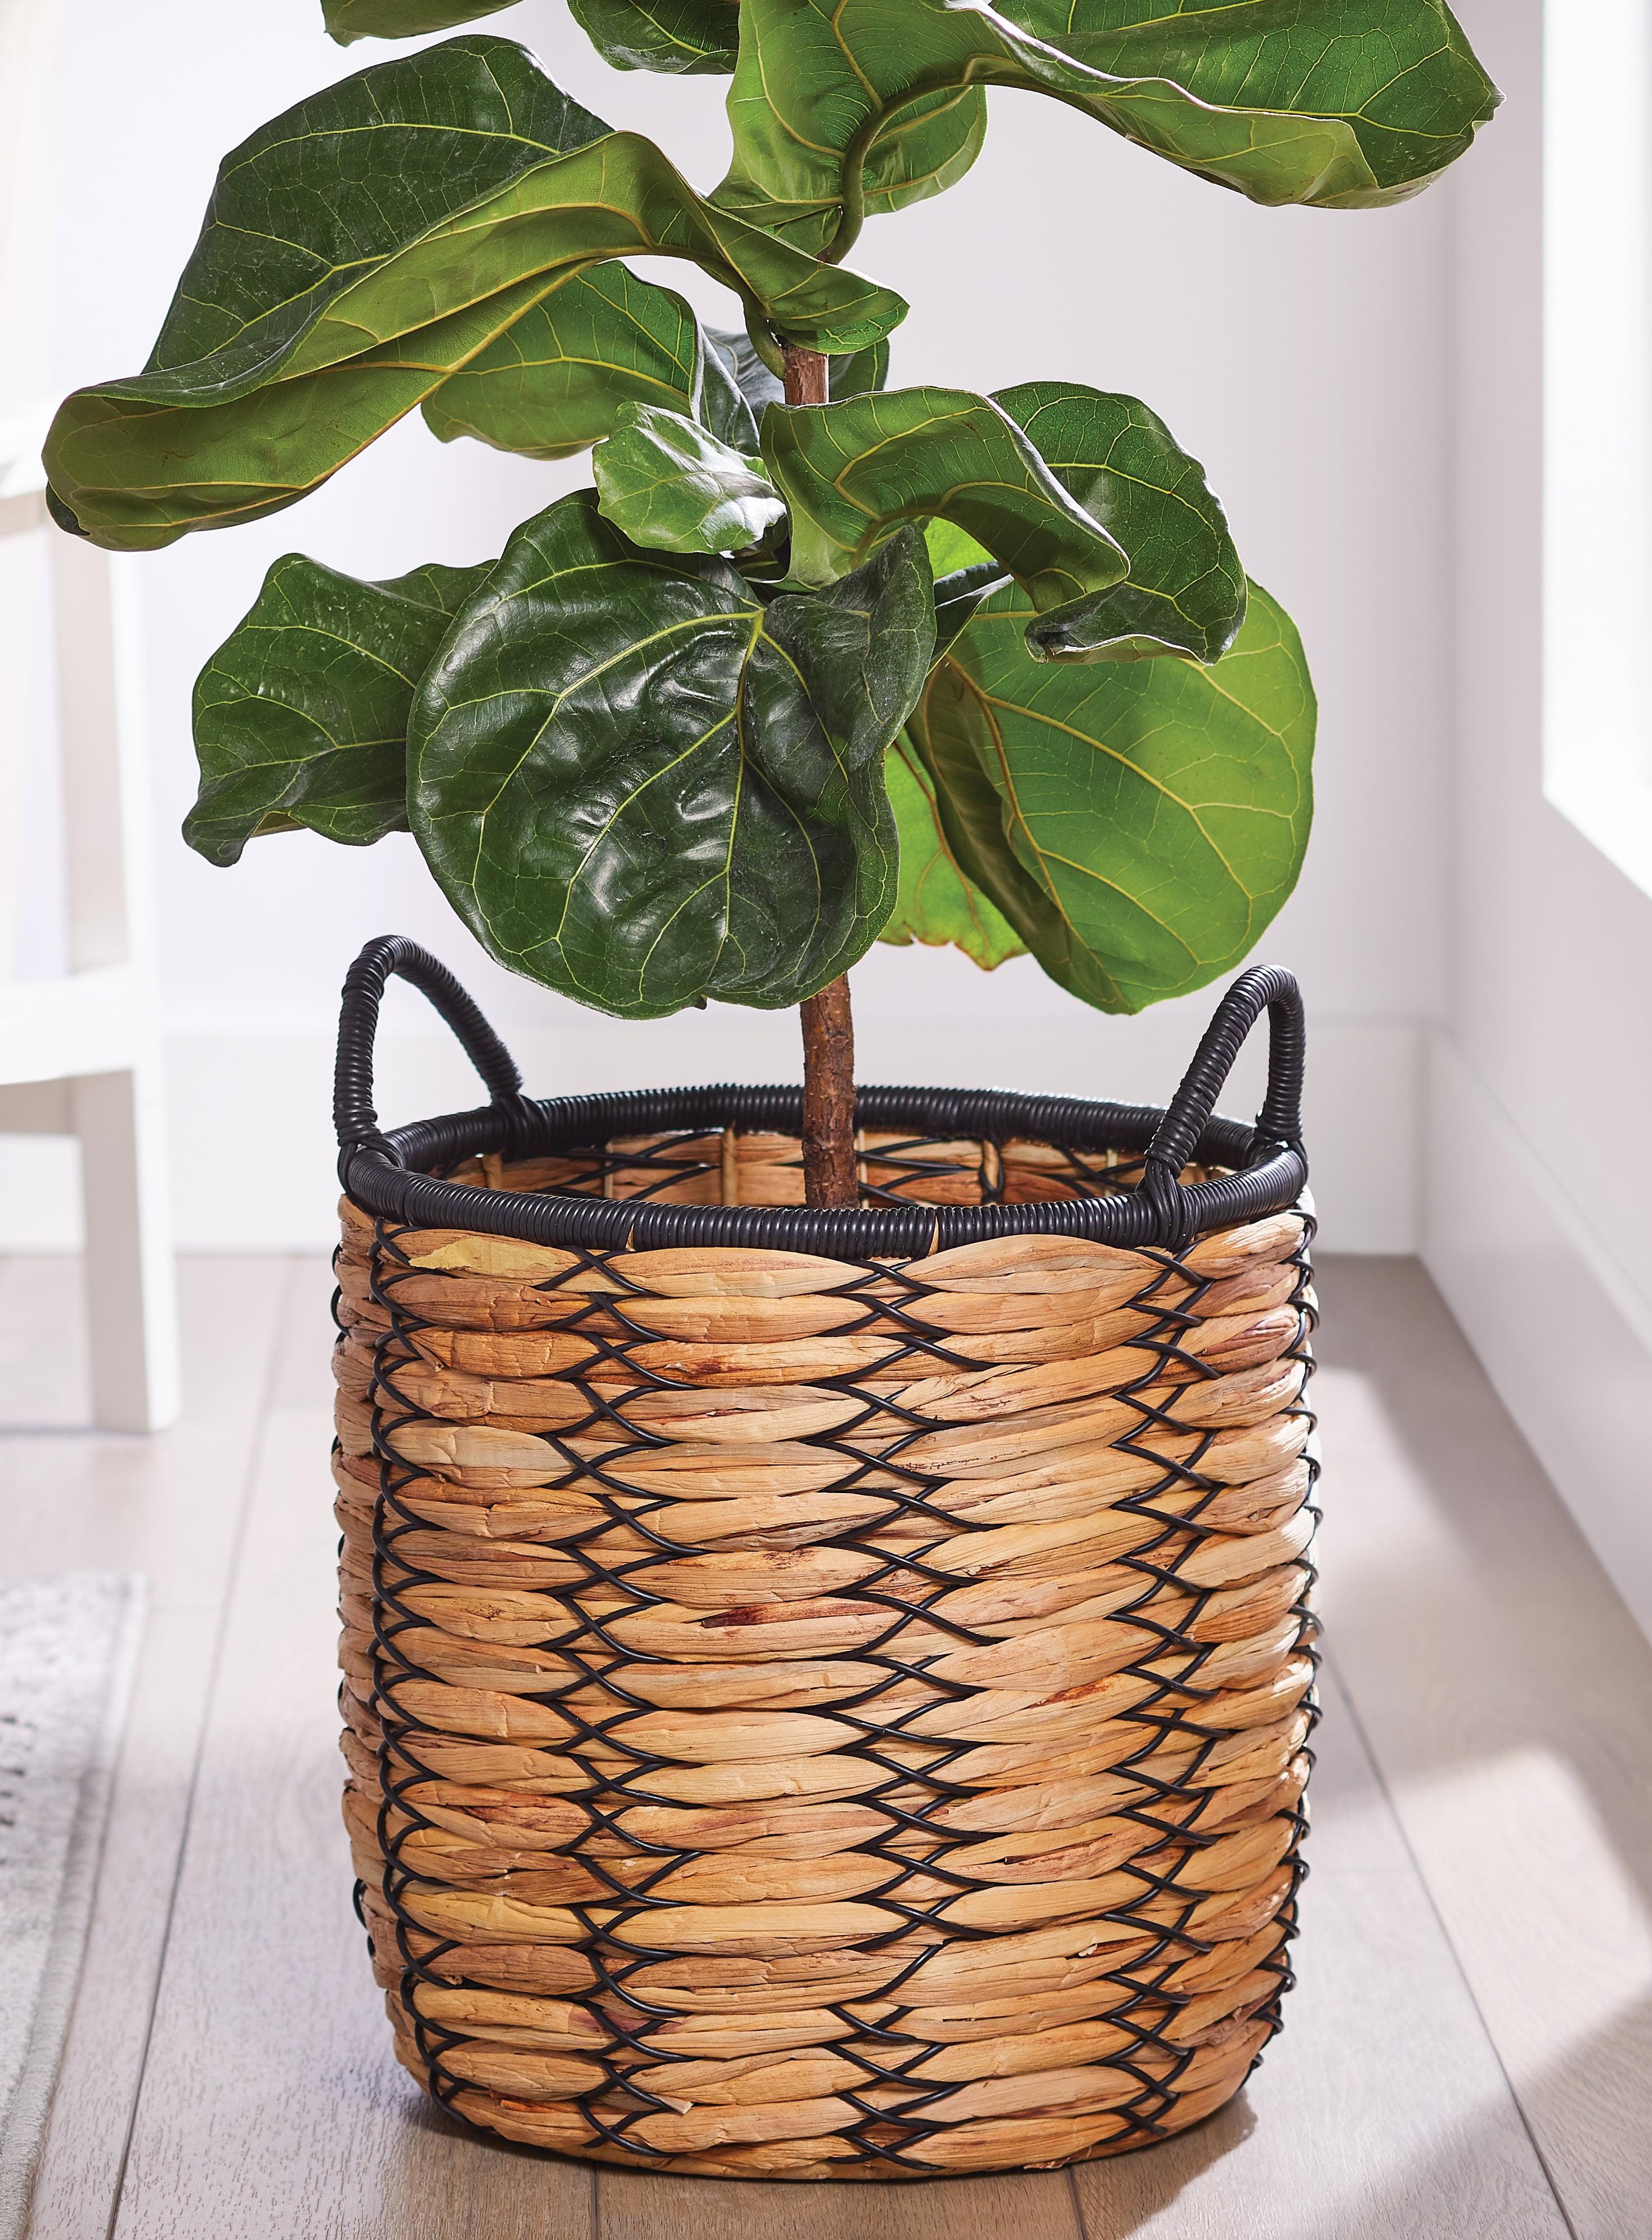 Shop Better Homes & Gardens 12 Inch Claren Woven Water Hyacinth Basket Planter from Walmart on Openhaus